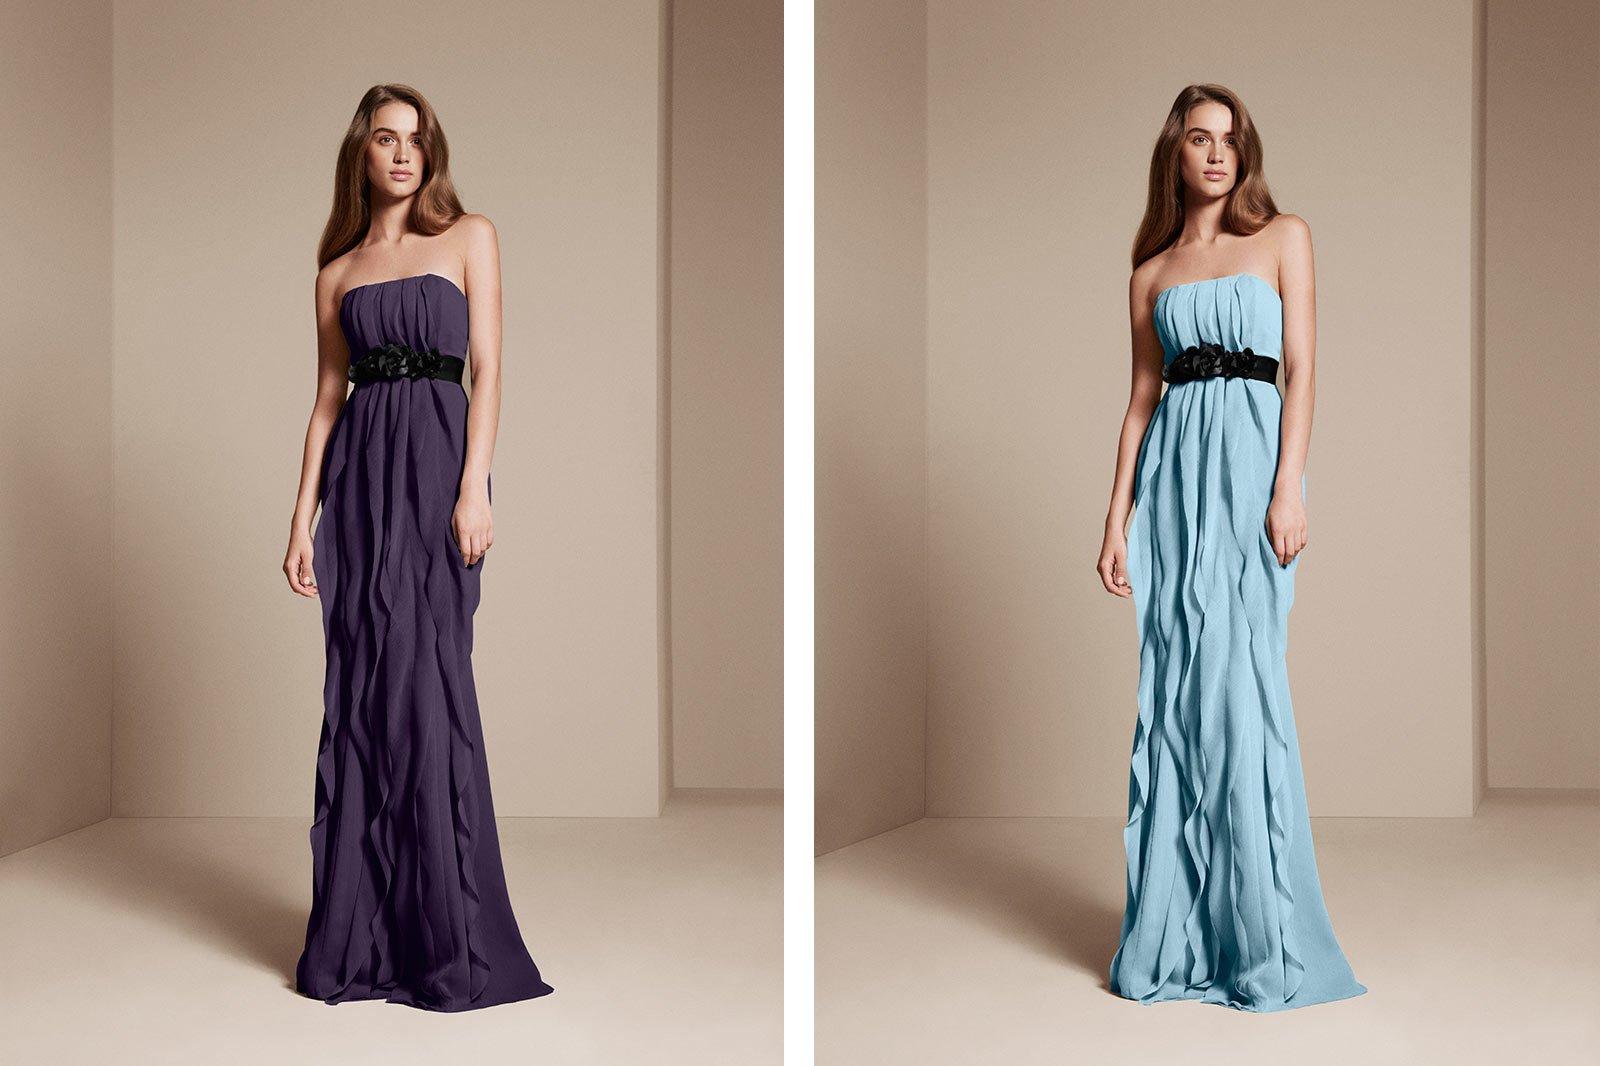 Colorways example - bridesmaid wearing bridesmaid dresses alternate blue and purple